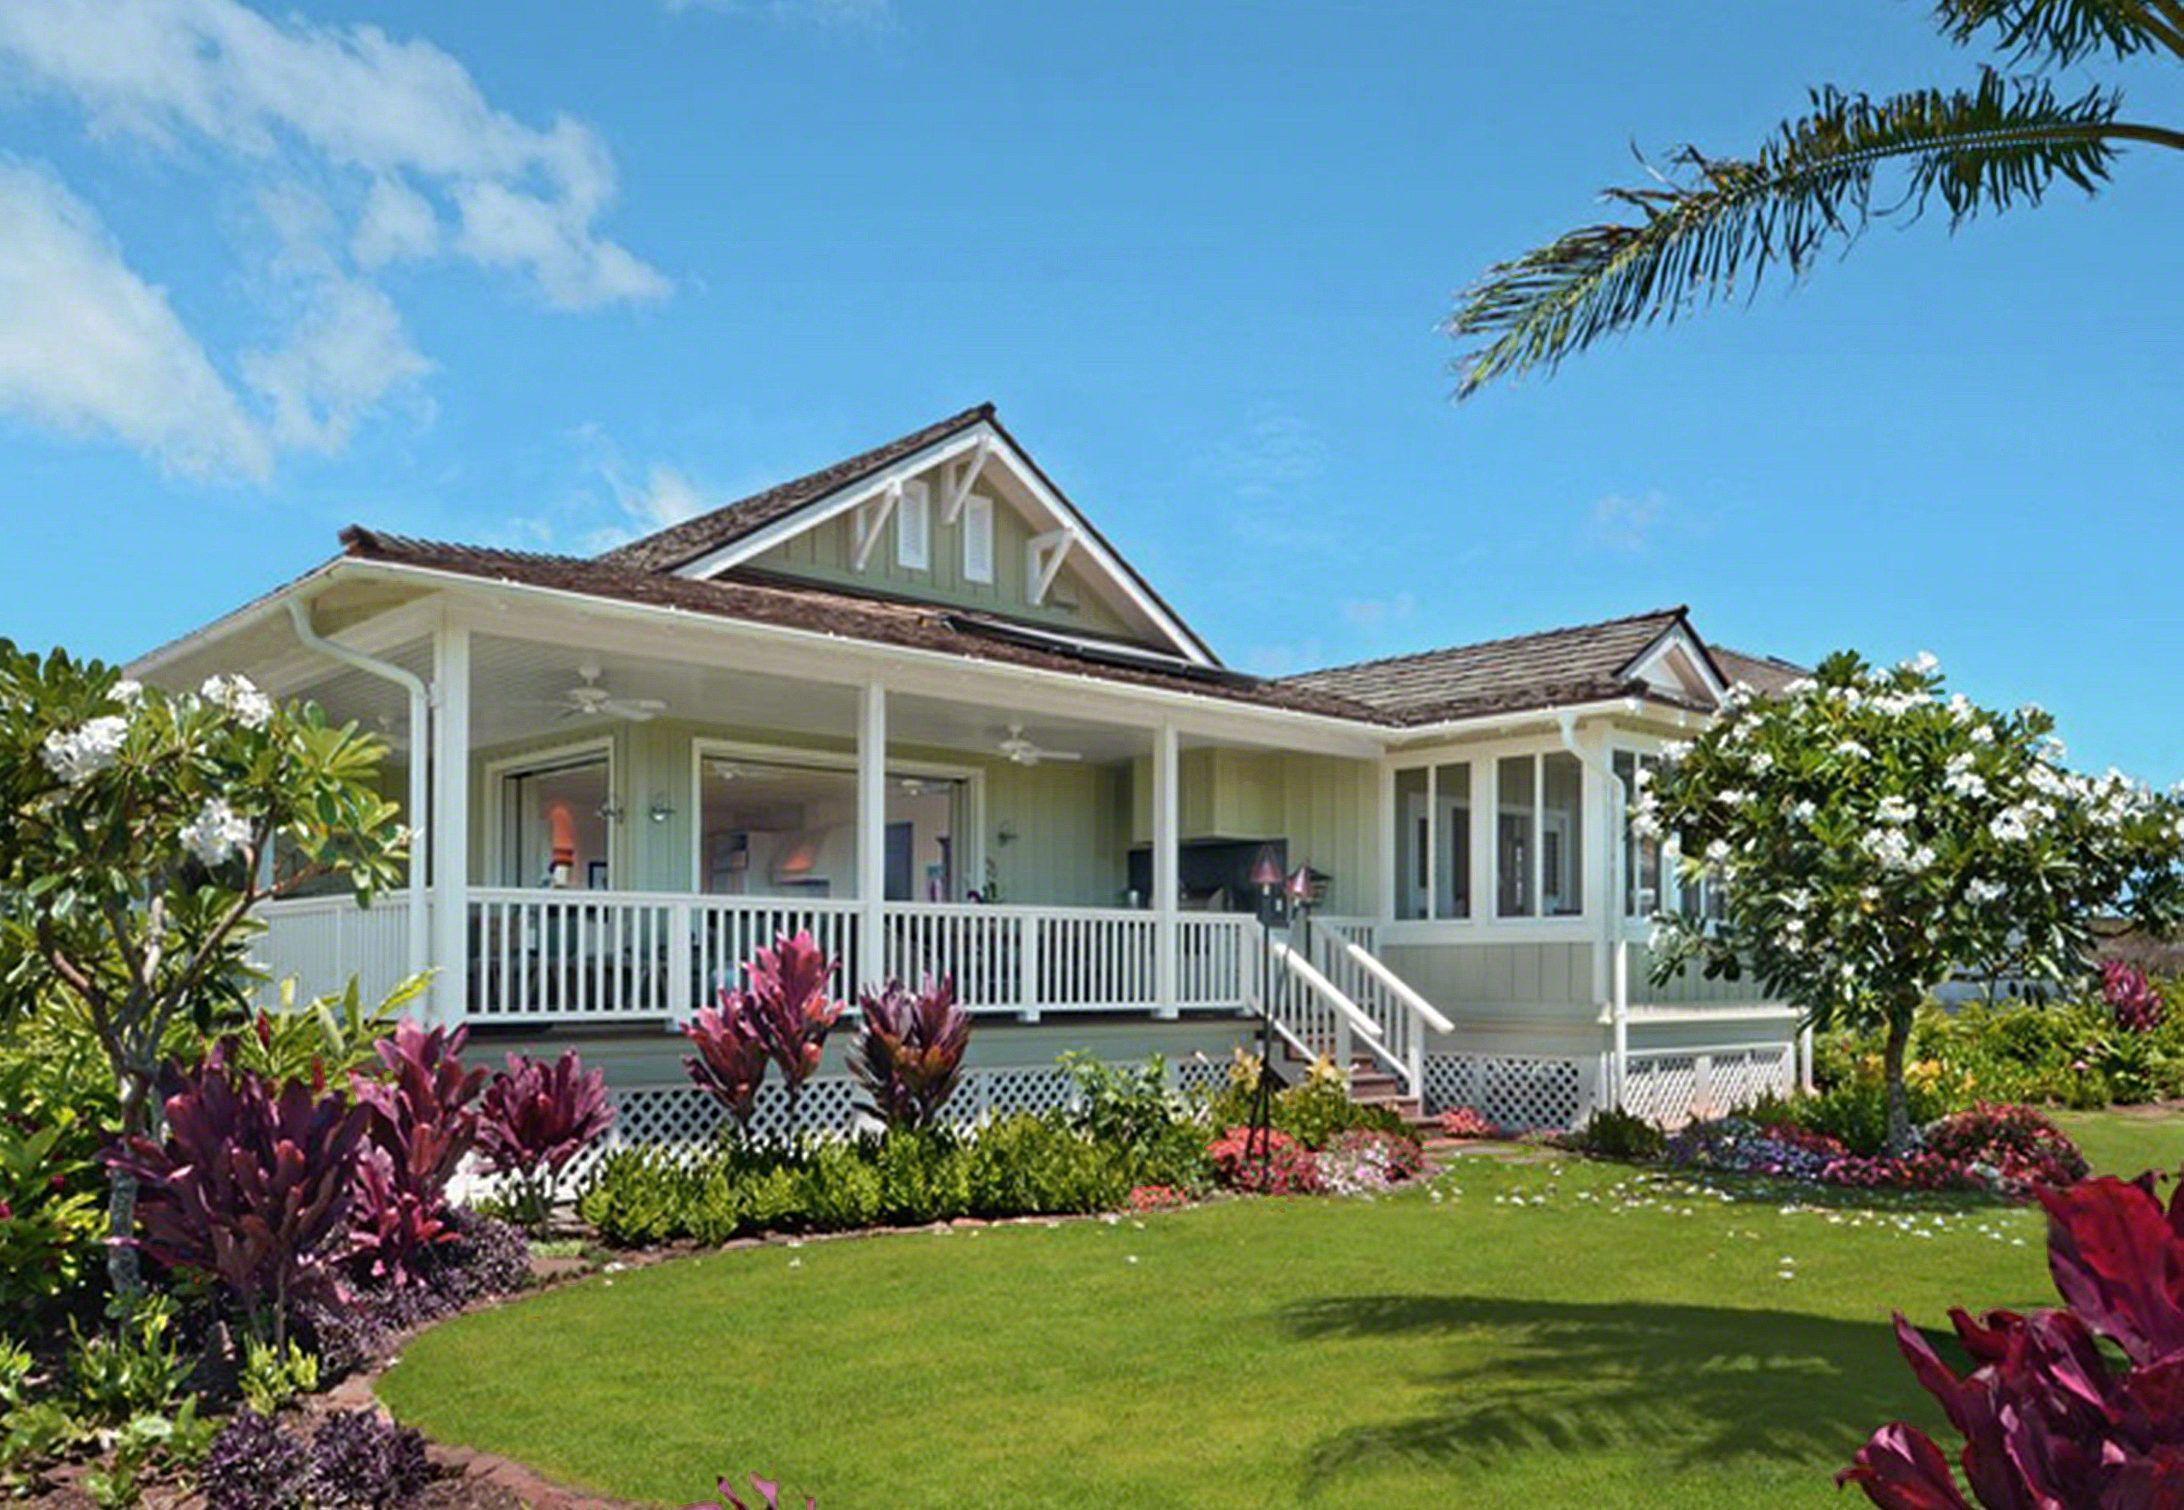 Cottages At Kukui Ula Poipu Kauai Hawaii Oz Architects Cottage Poipu Beautiful Homes